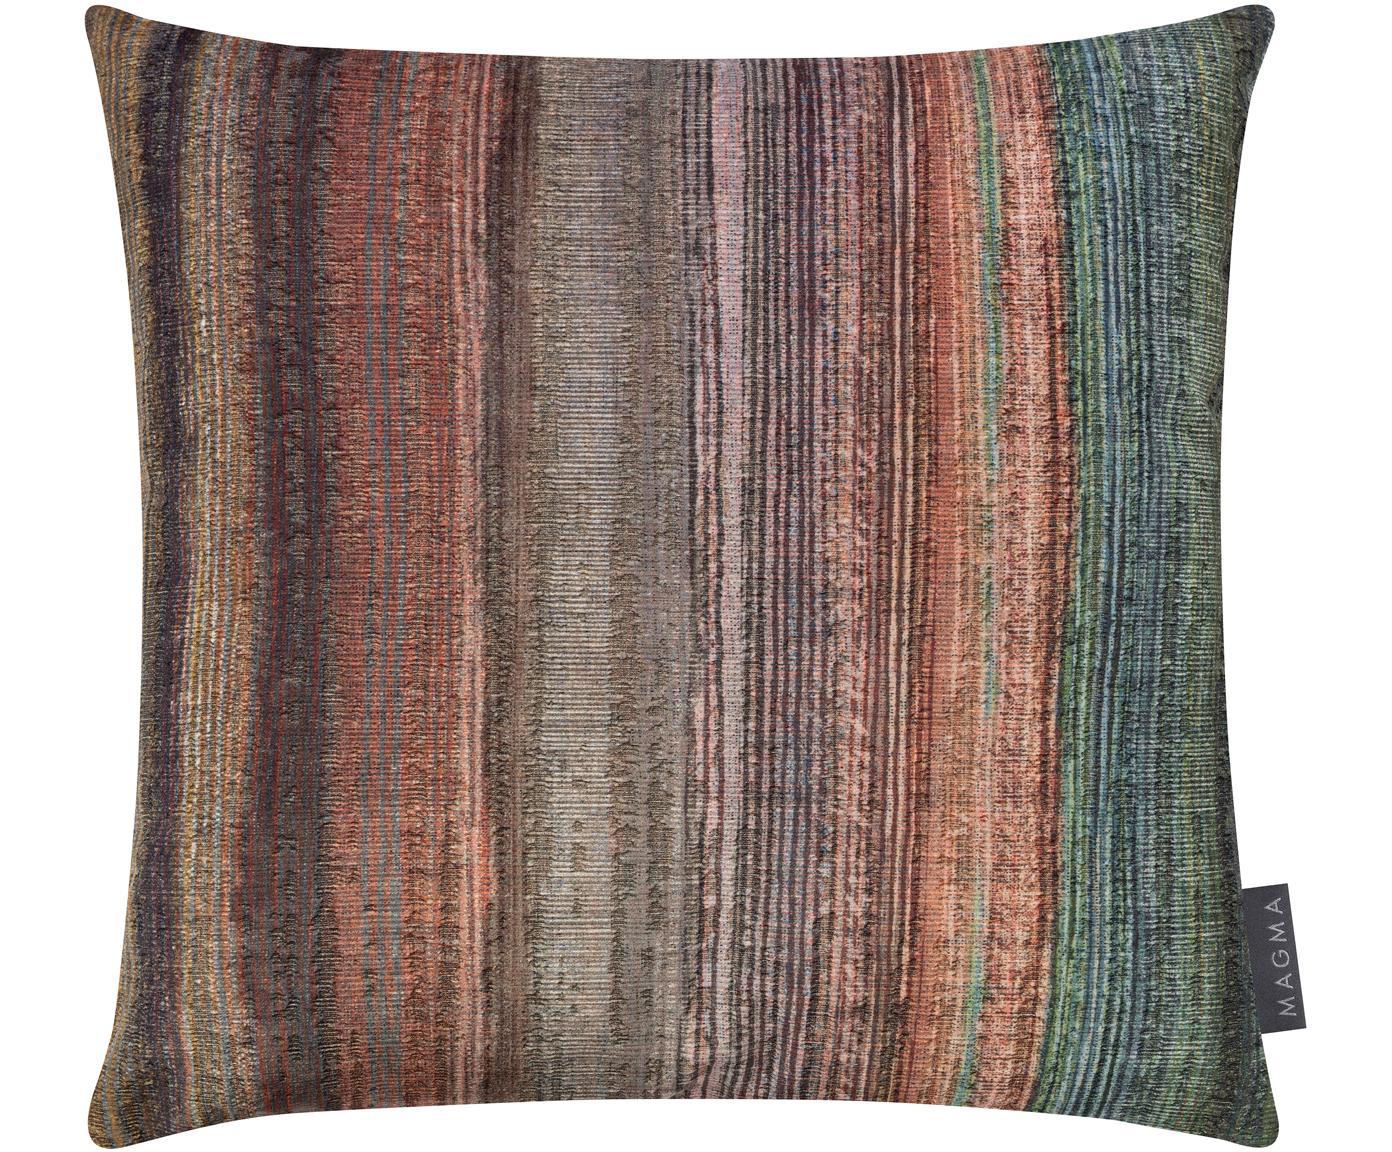 Samt-Kissenhülle Timon, Polyestersamt, Mehrfarbig, Petrolblau, 40 x 40 cm